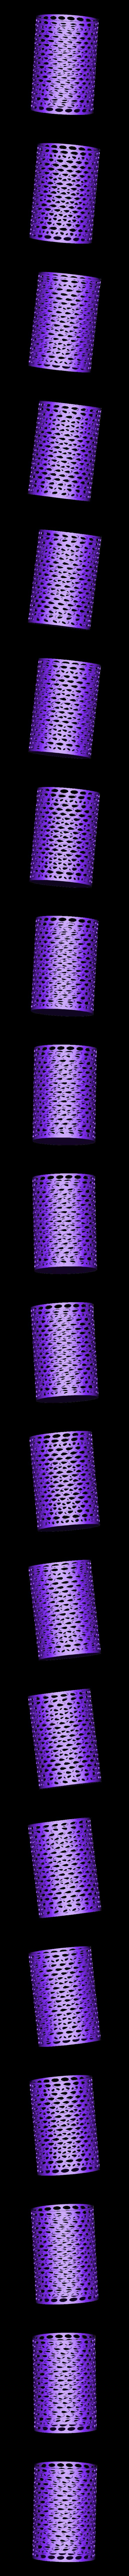 Vase_With_Holes.stl Download free STL file Zortrax Vases • 3D printable design, Zortrax